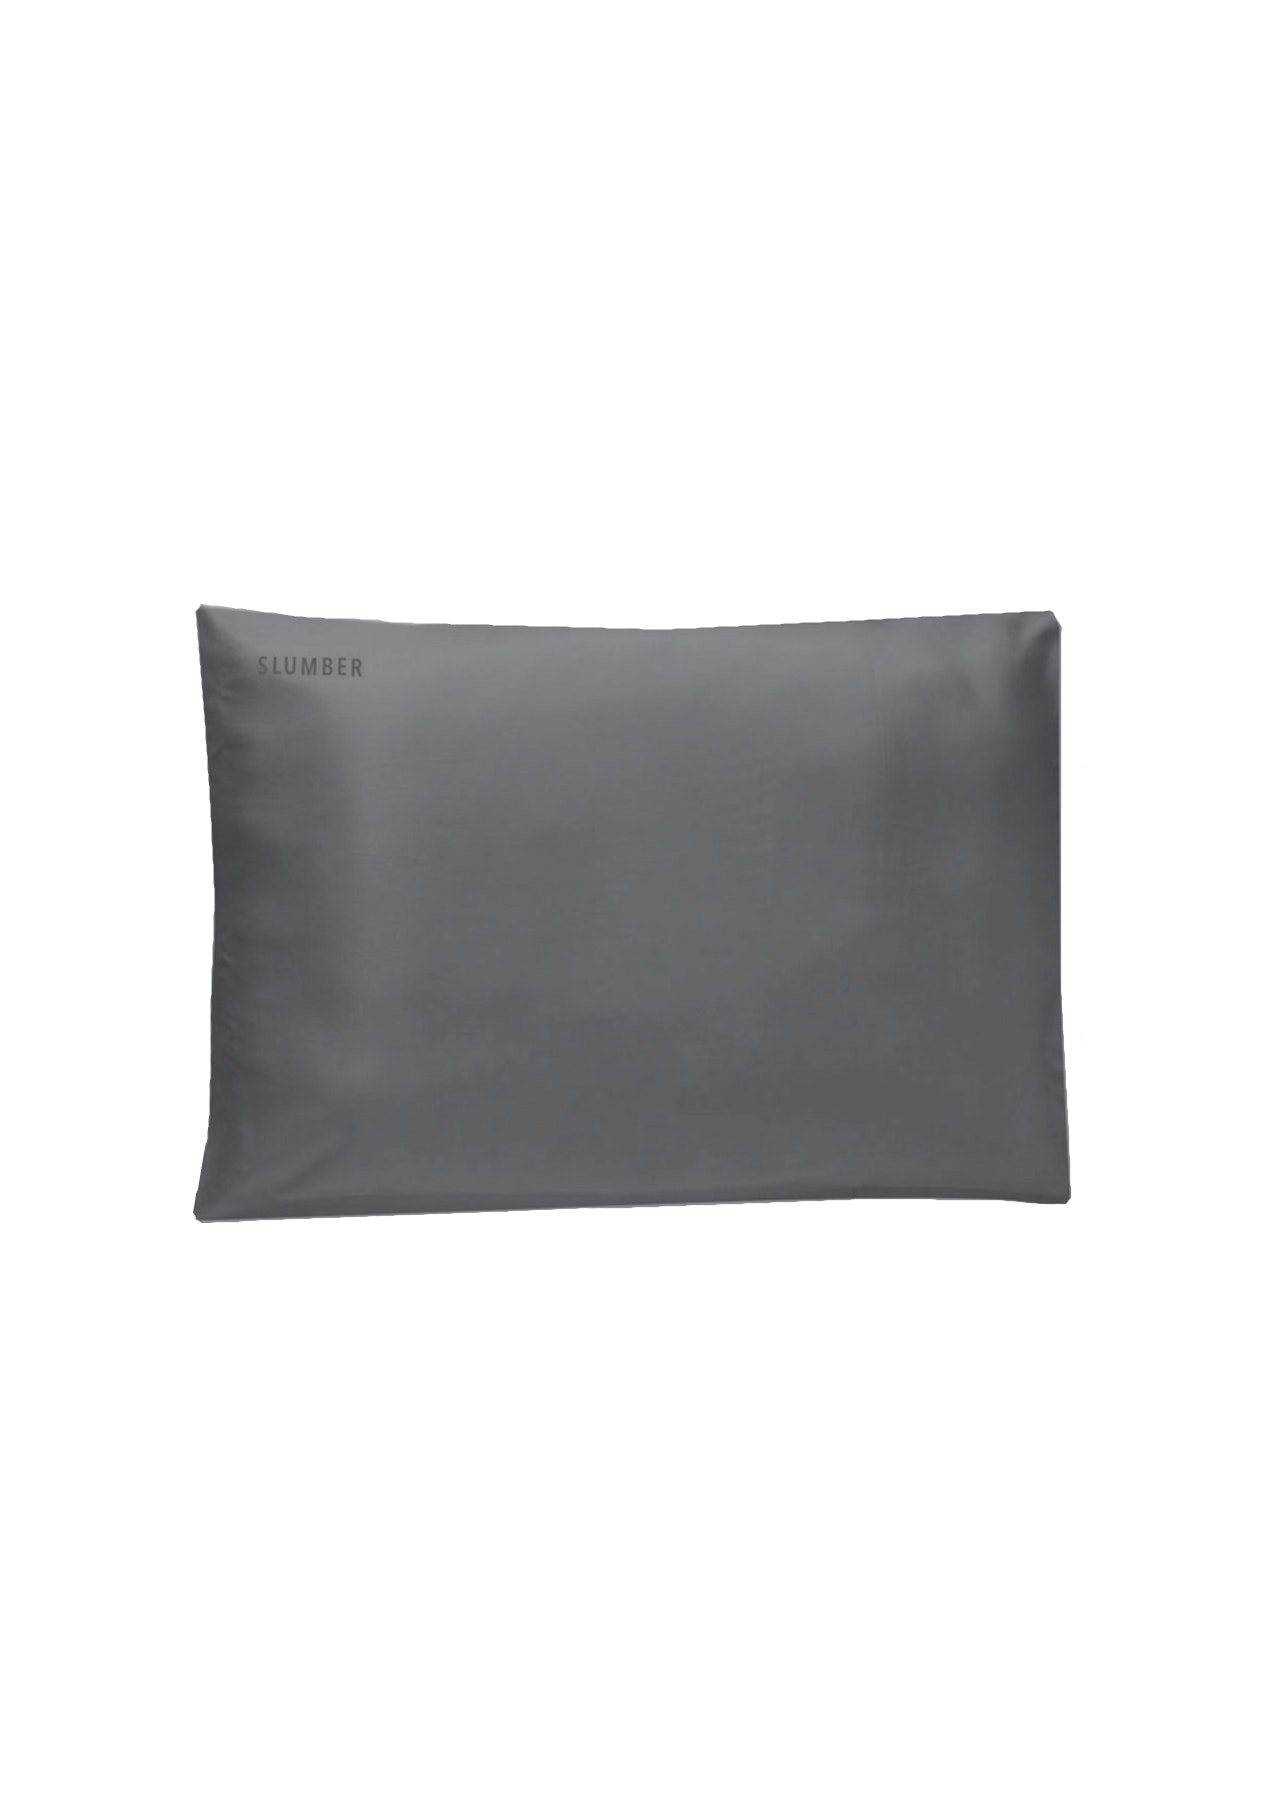 SLUMBER 100% SILK PILLOWCASE - Charcoal